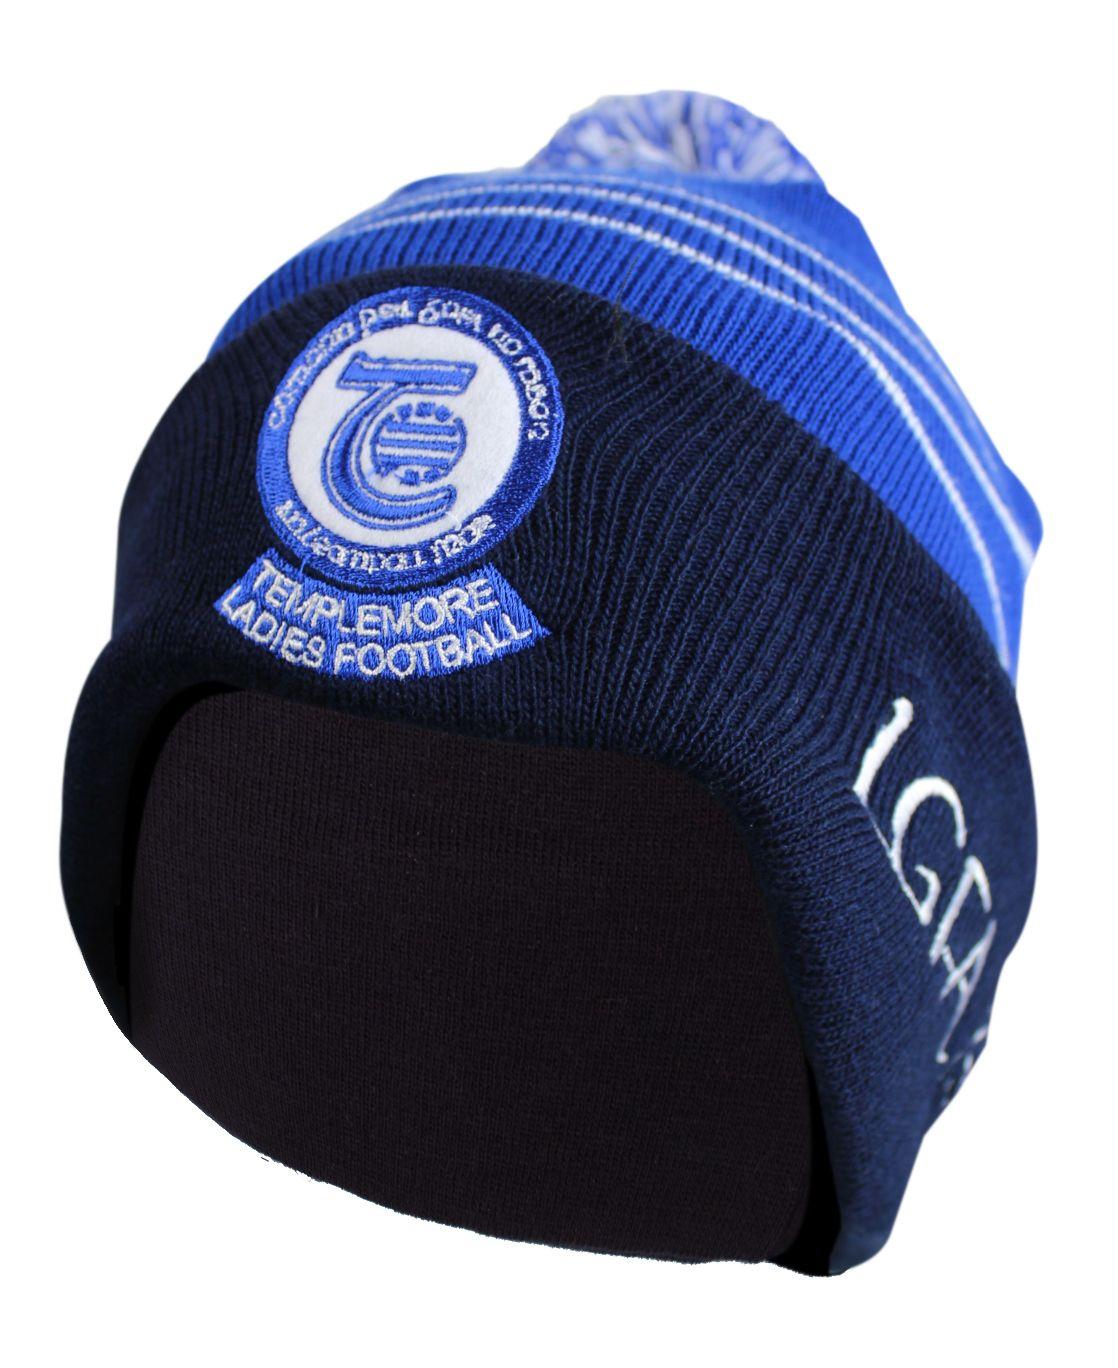 TEMPLEMORE LGFA BOBBLE HAT.jpg